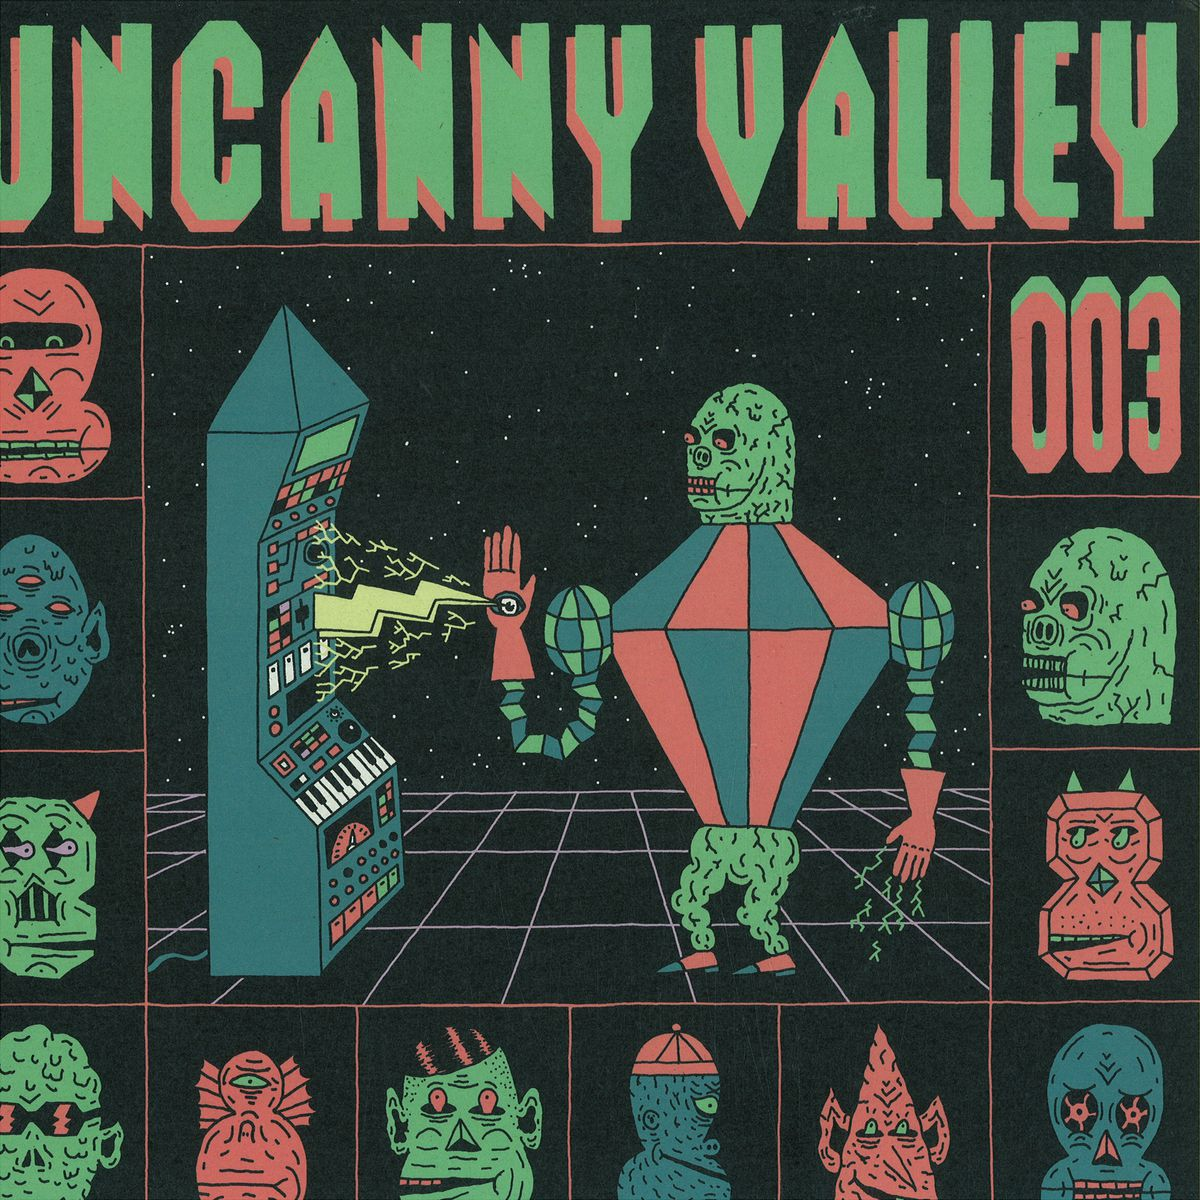 theuncannyvalley